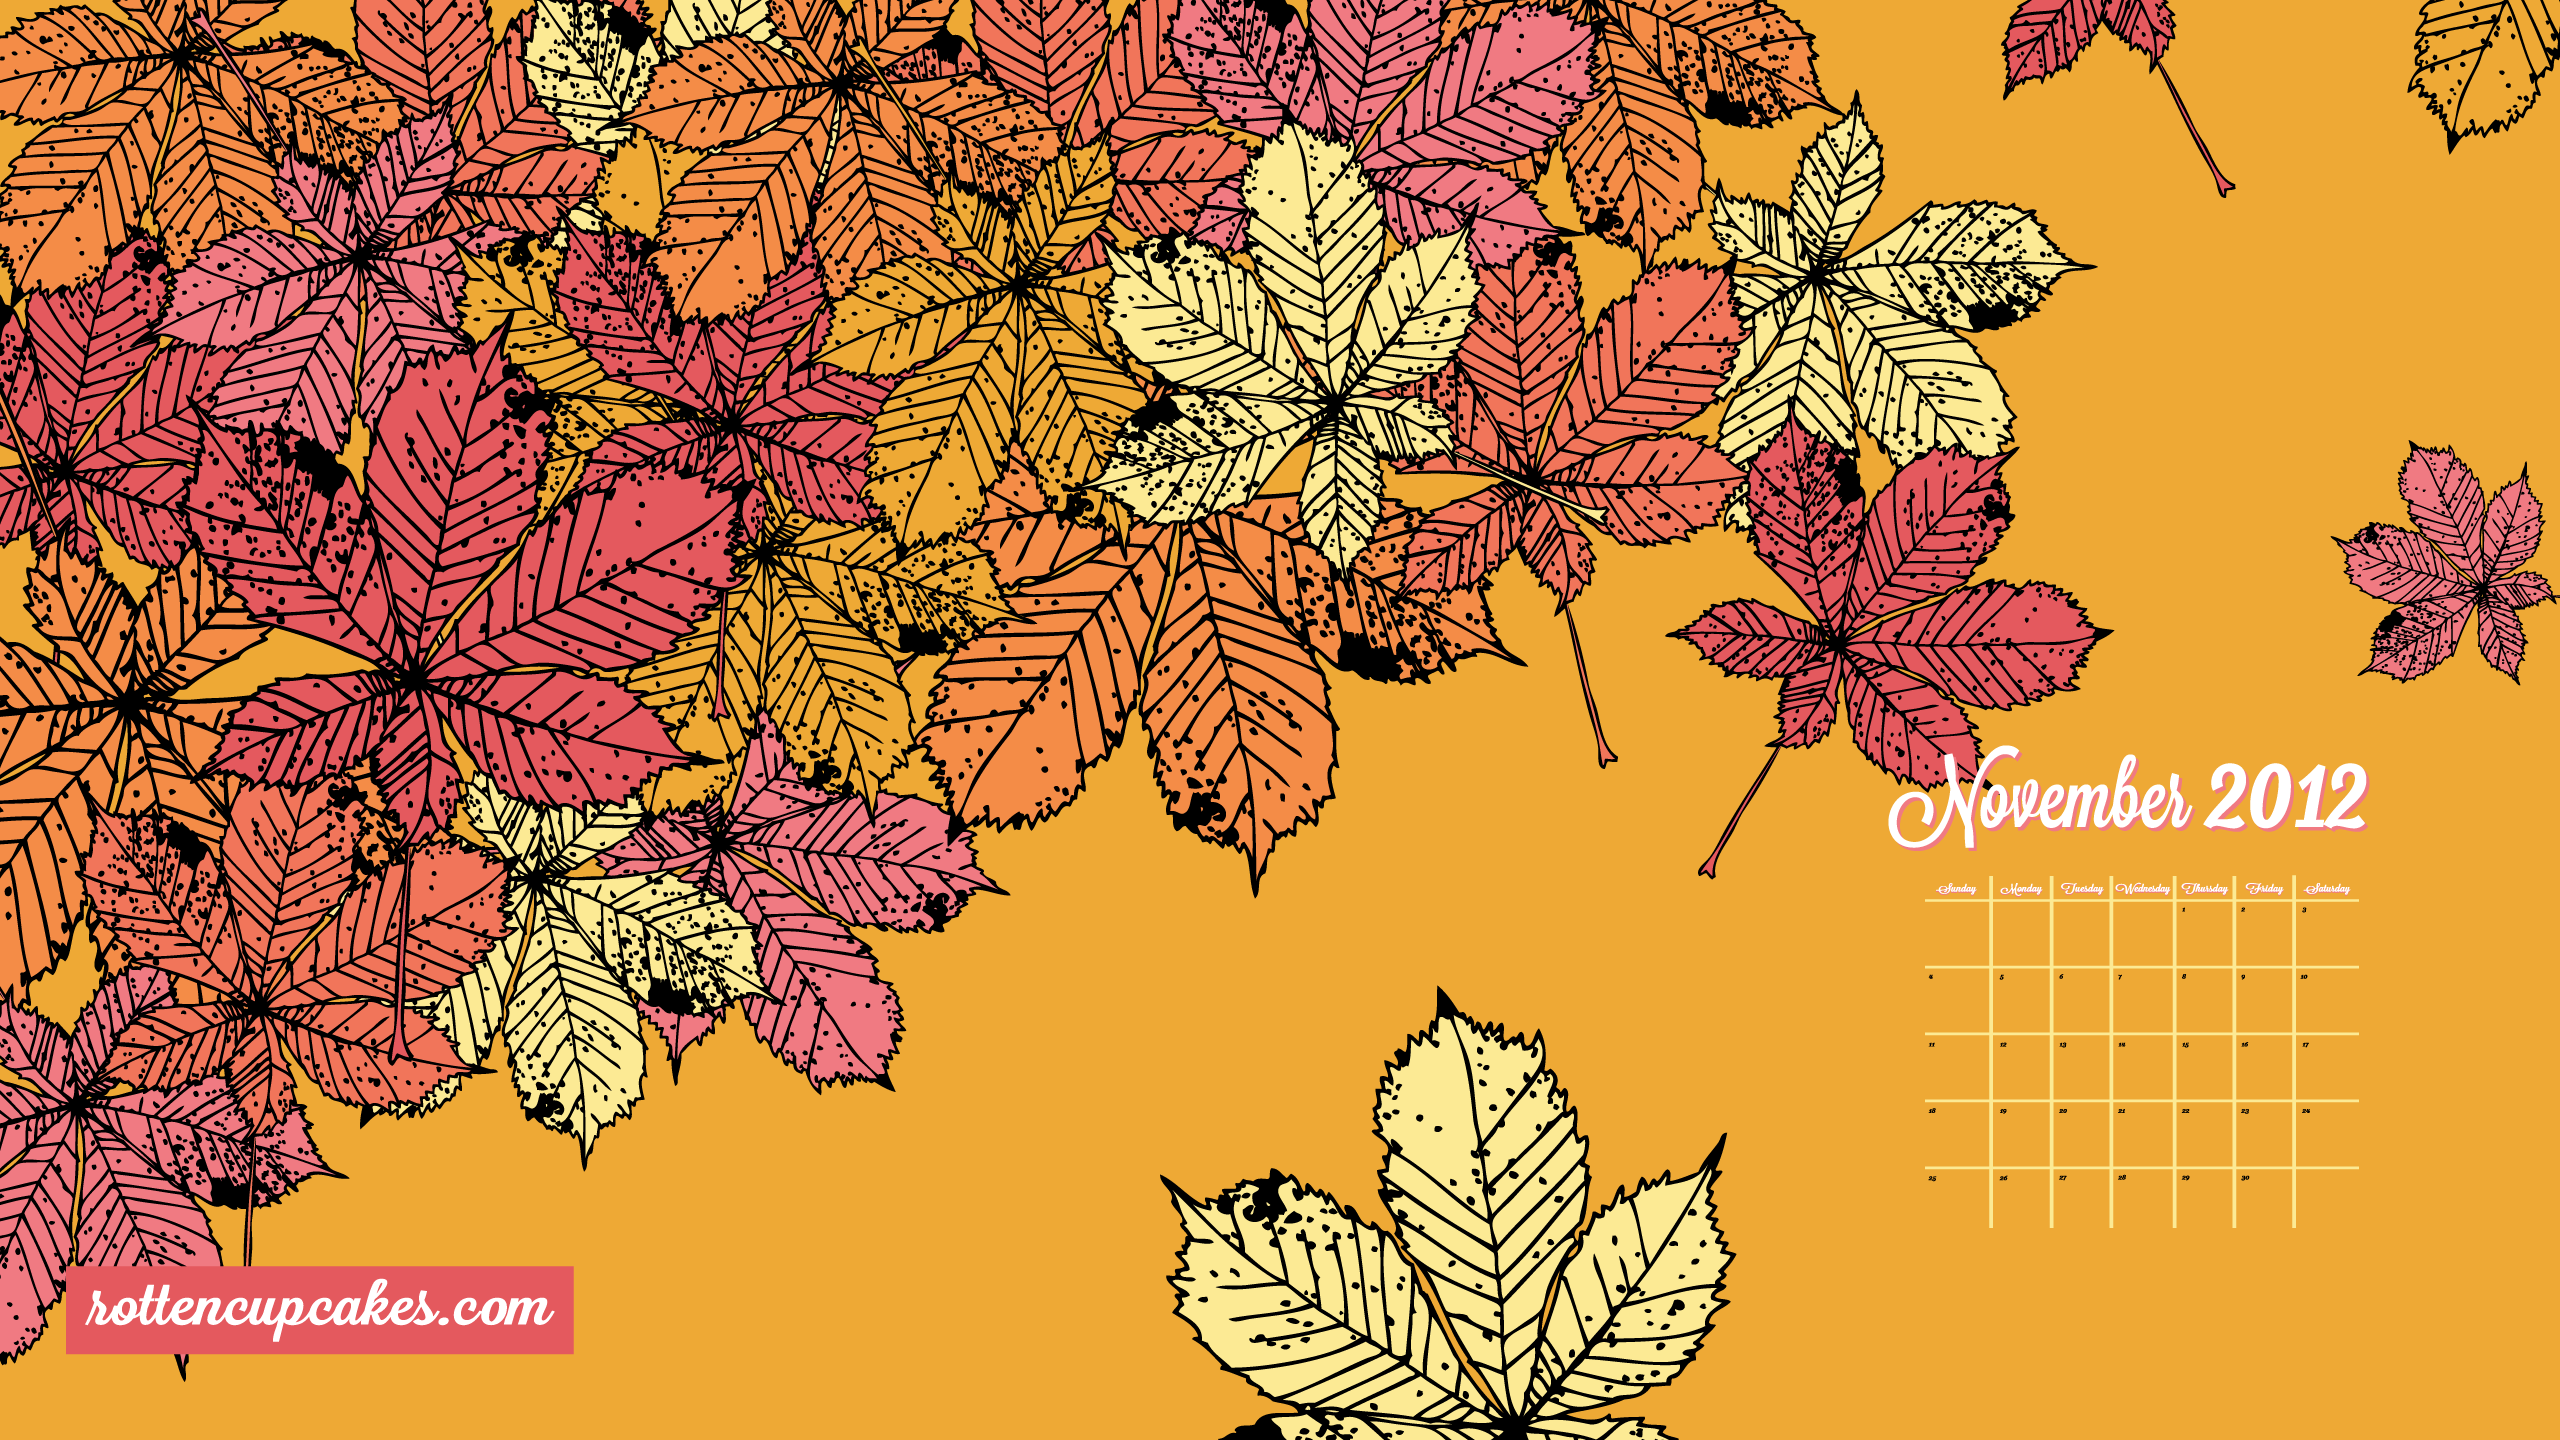 November 2012 Calendar Desktop IPhone Wallpaper